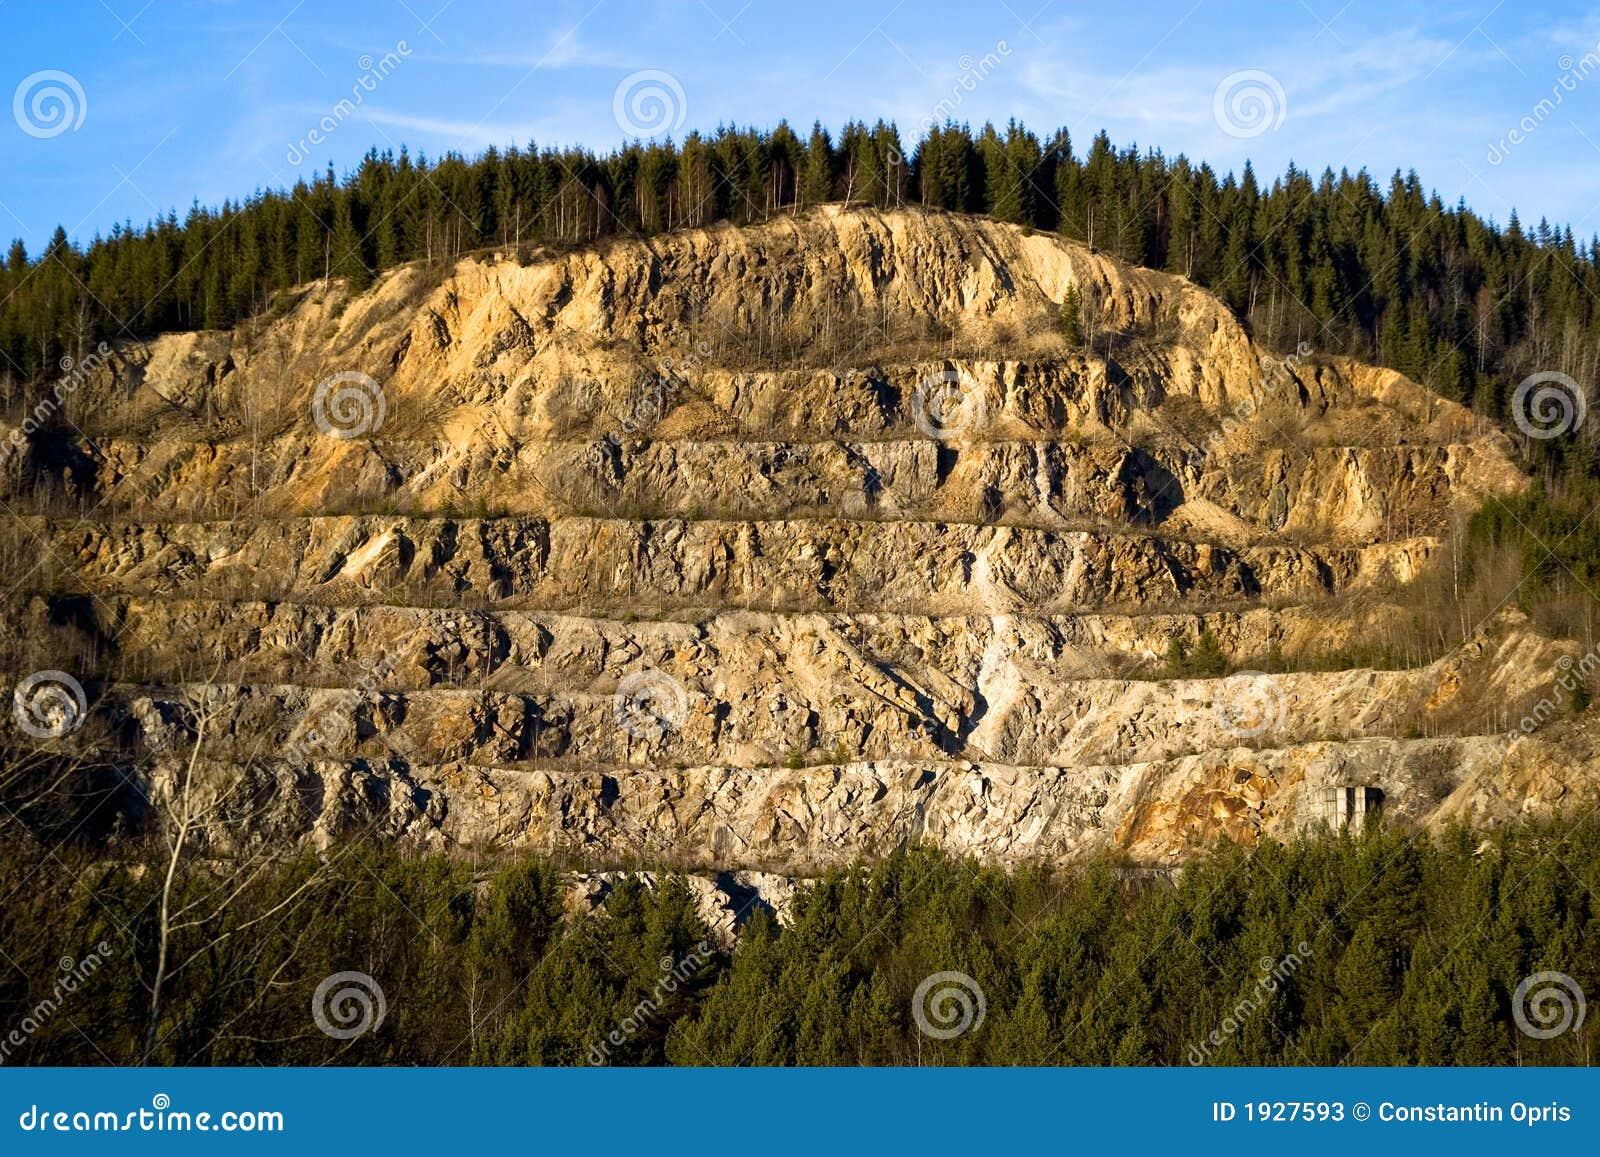 Against strip mining